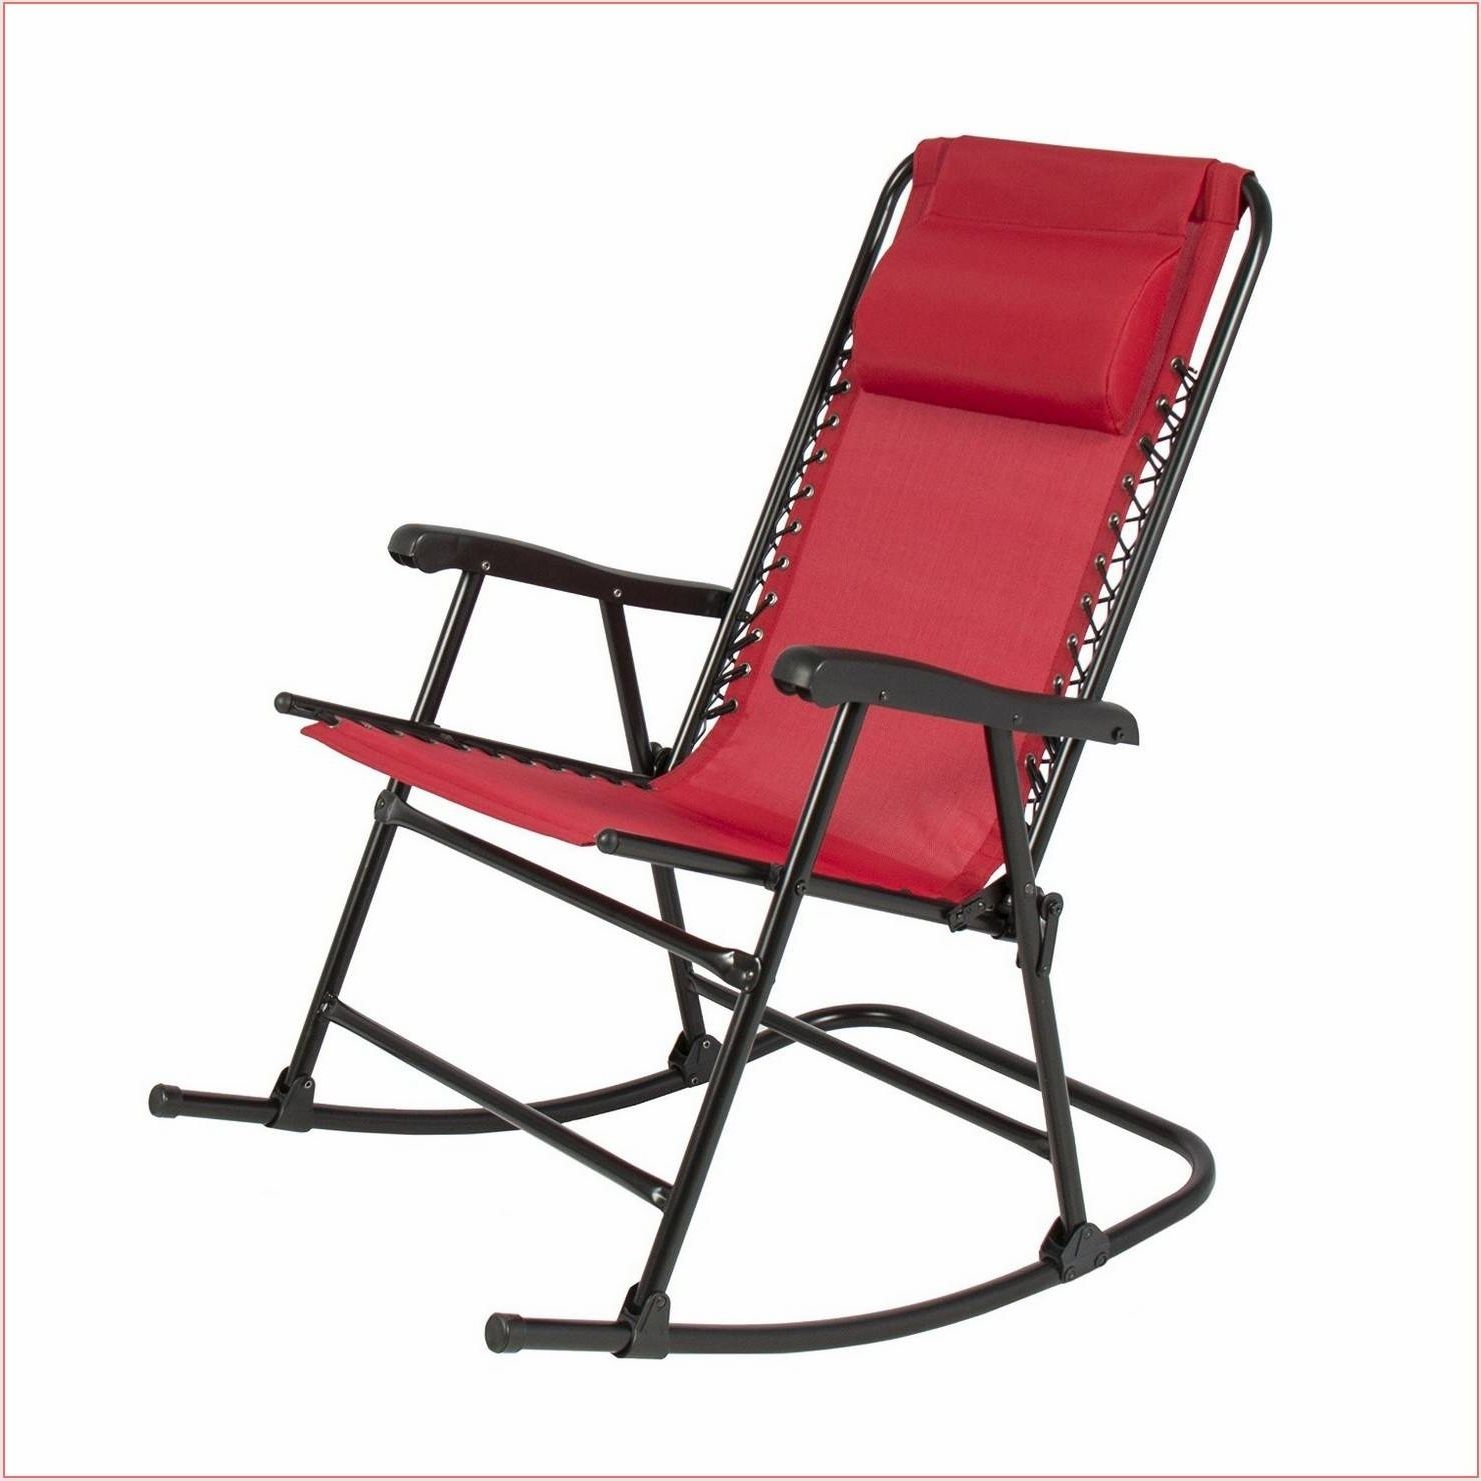 Plus Size Folding Lawn Chairs Rocking Lawn Chair Wooden Lawn